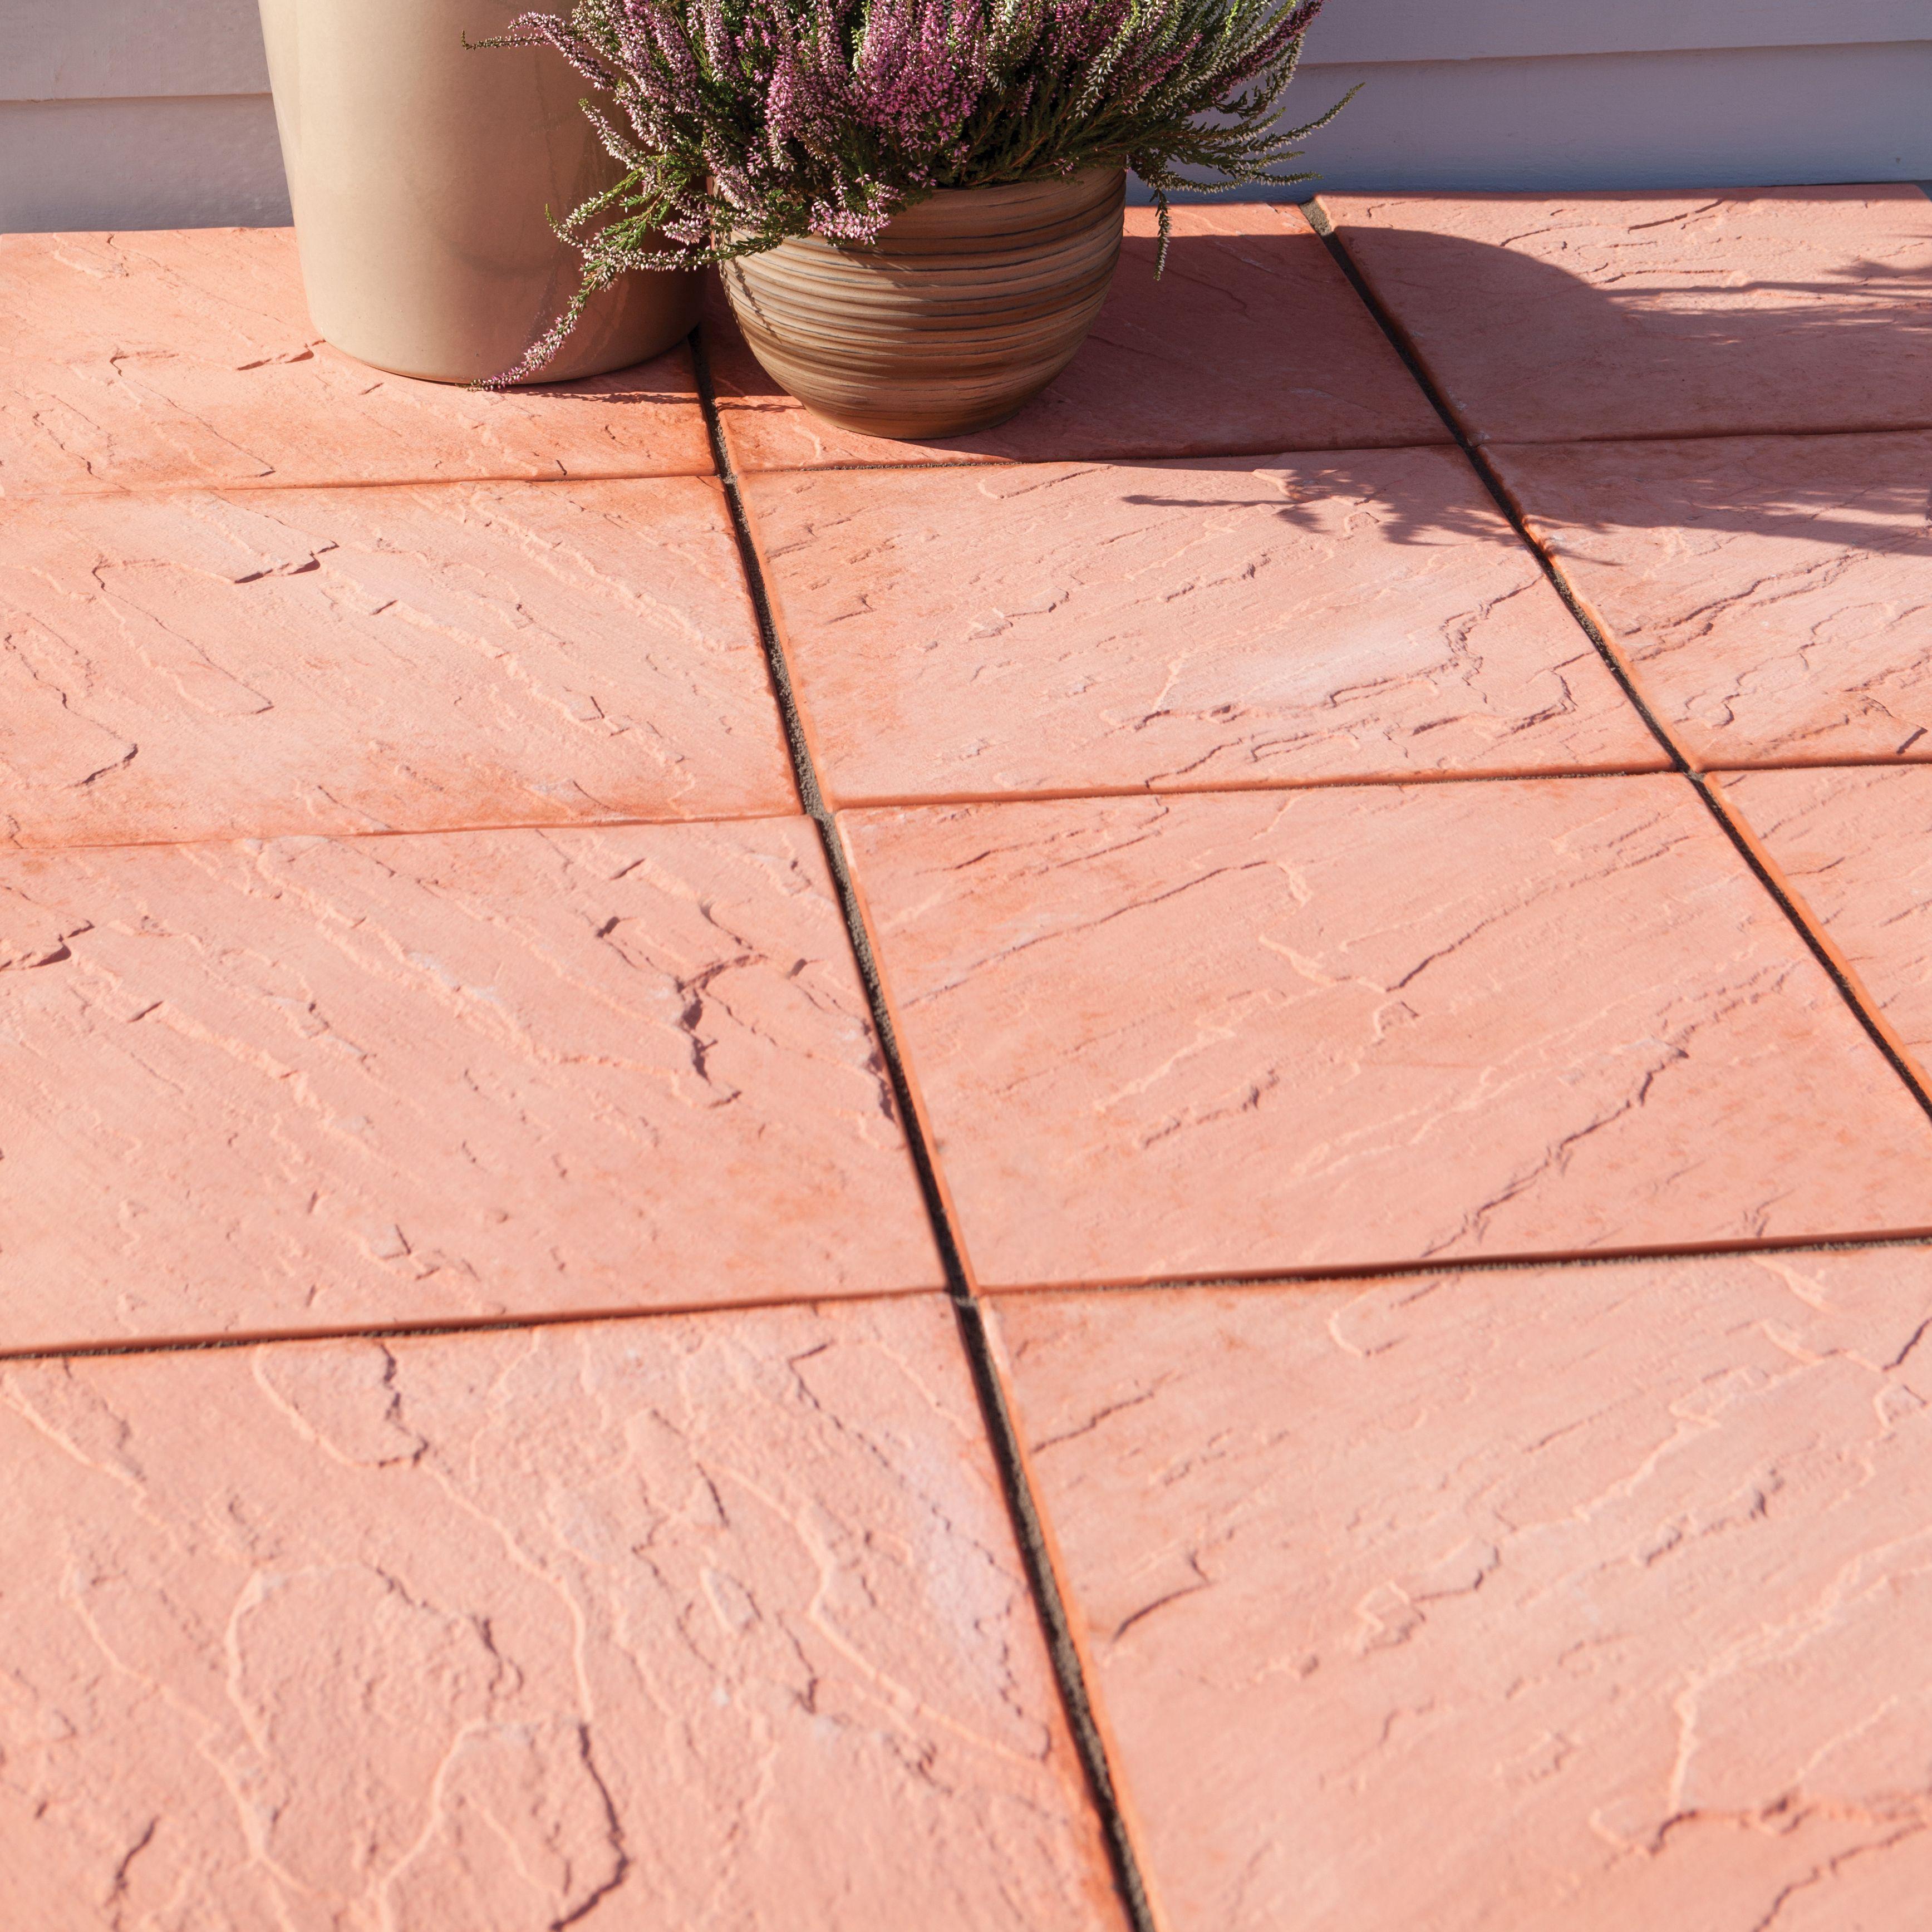 Terracotta Derbyshire Single Paving Slab L450mm W450mm  : 501511135729001i from diy.com size 3471 x 3471 jpeg 1147kB